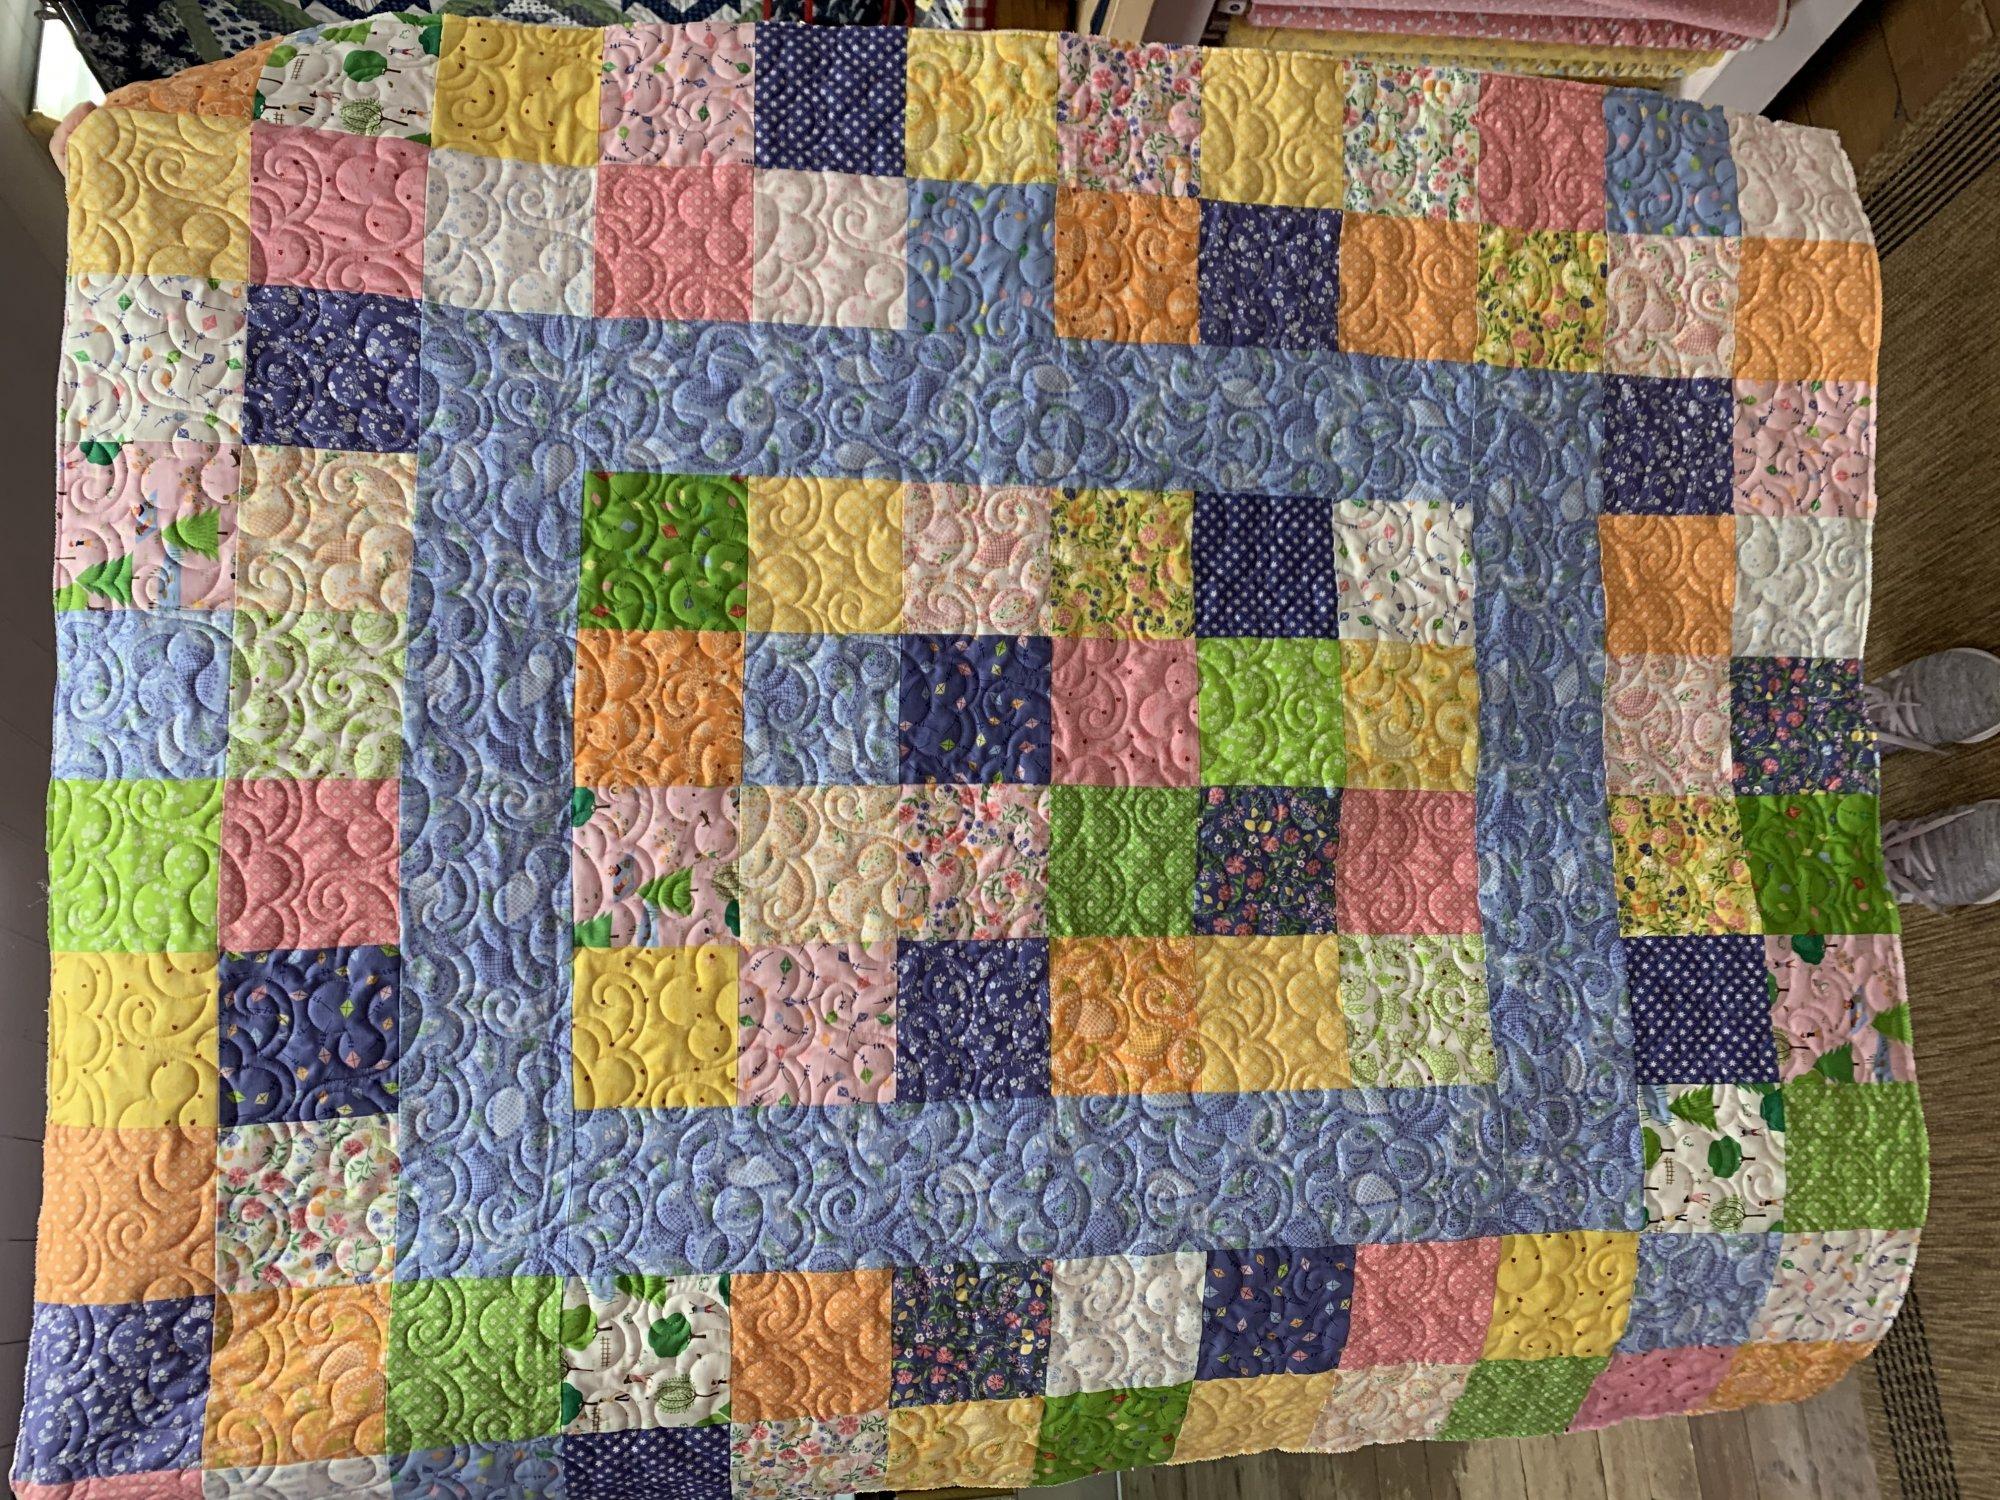 Sunday Picnic Quilt Kit